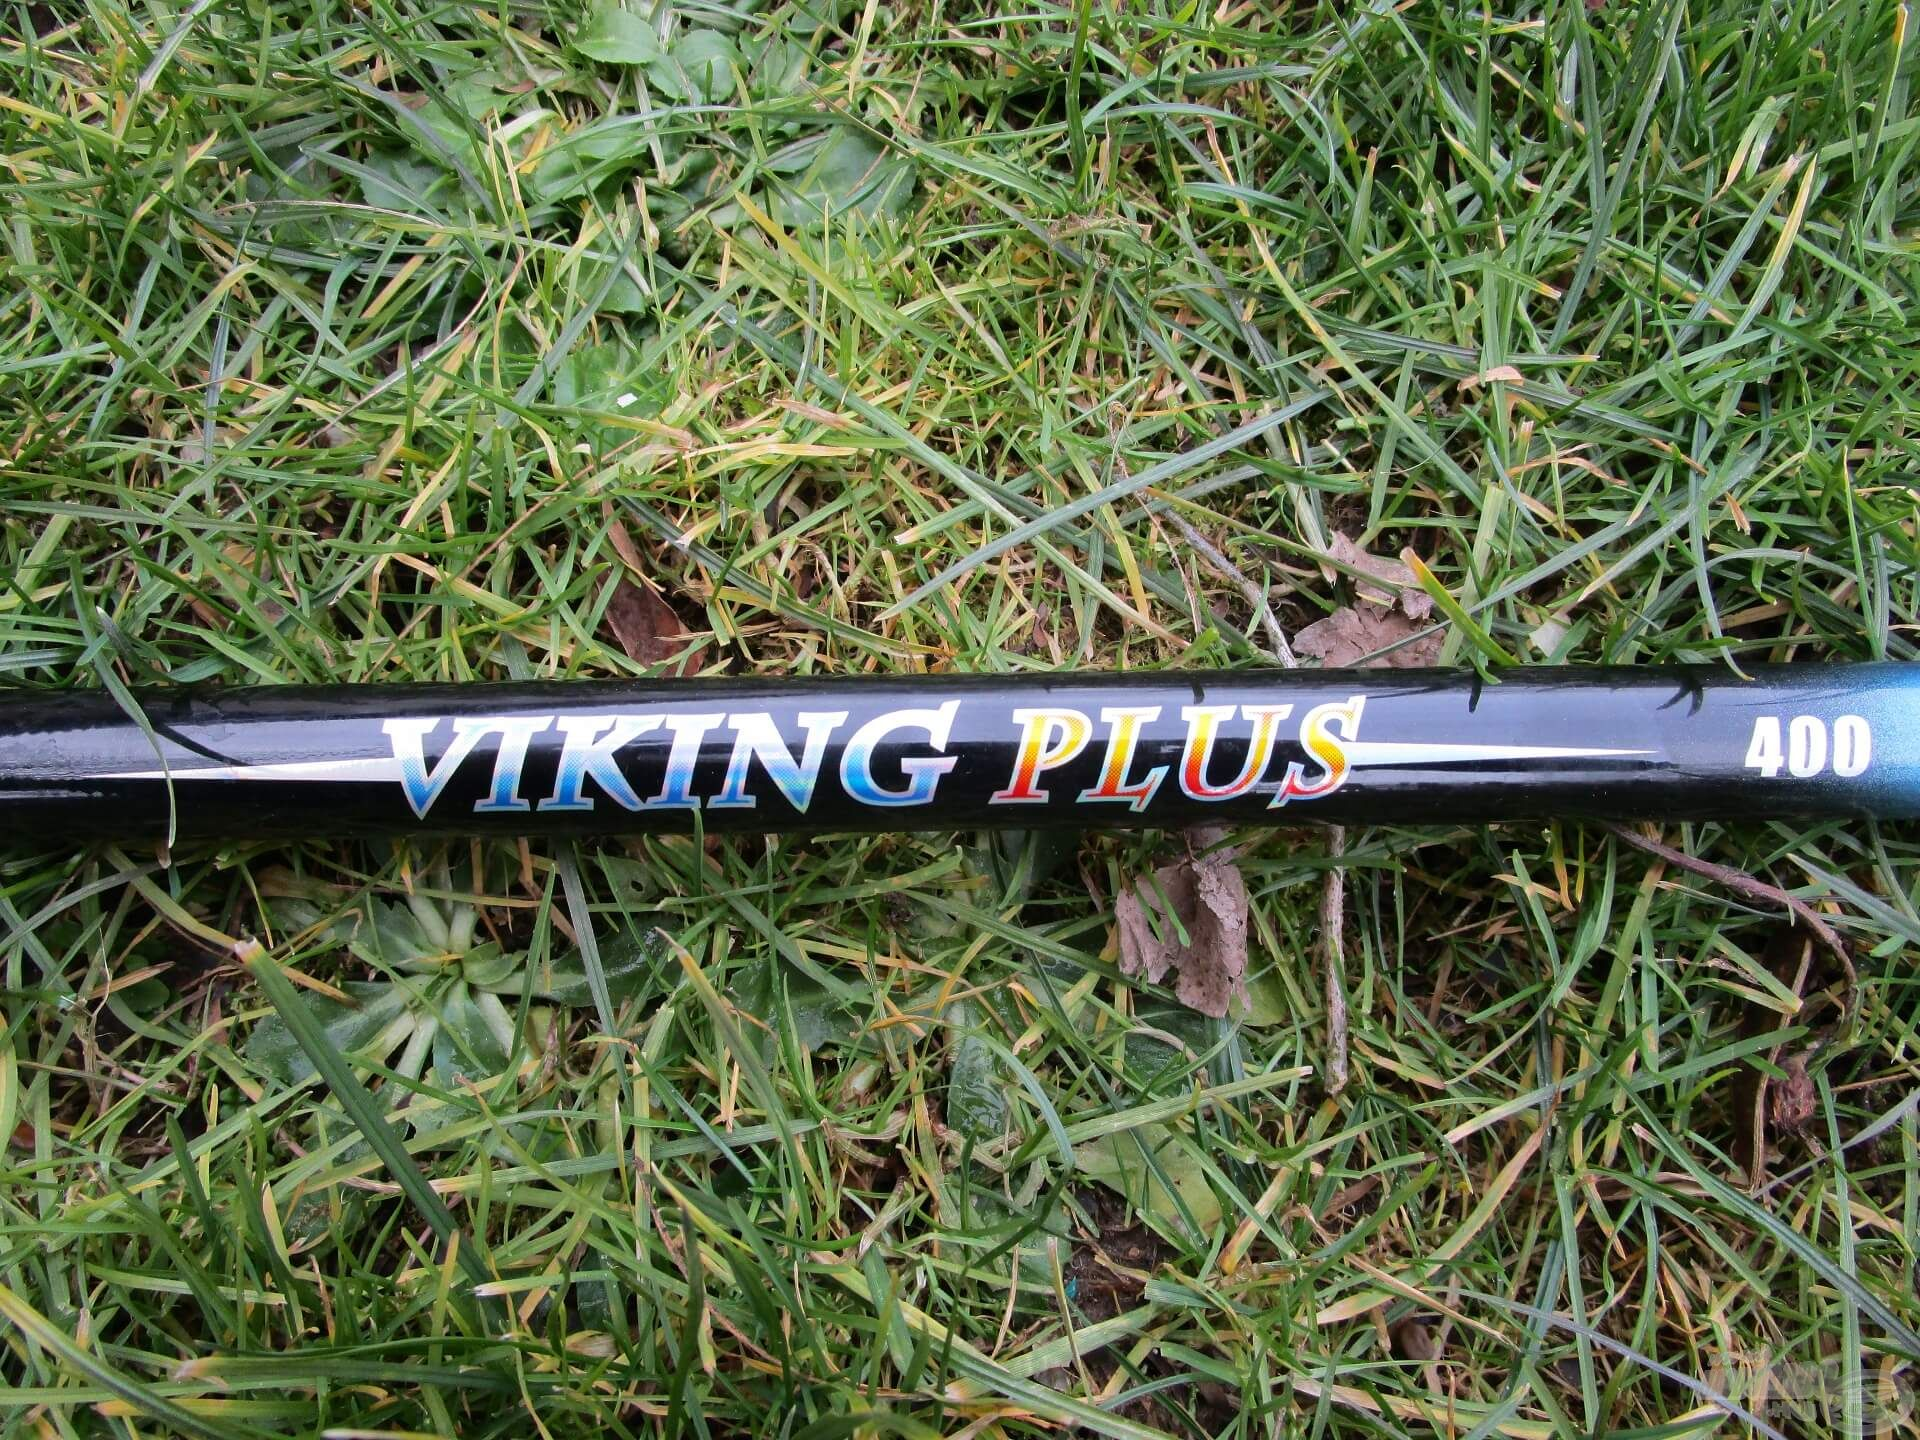 A rövidebb spiccbotom egy Energo Team Viking Plus